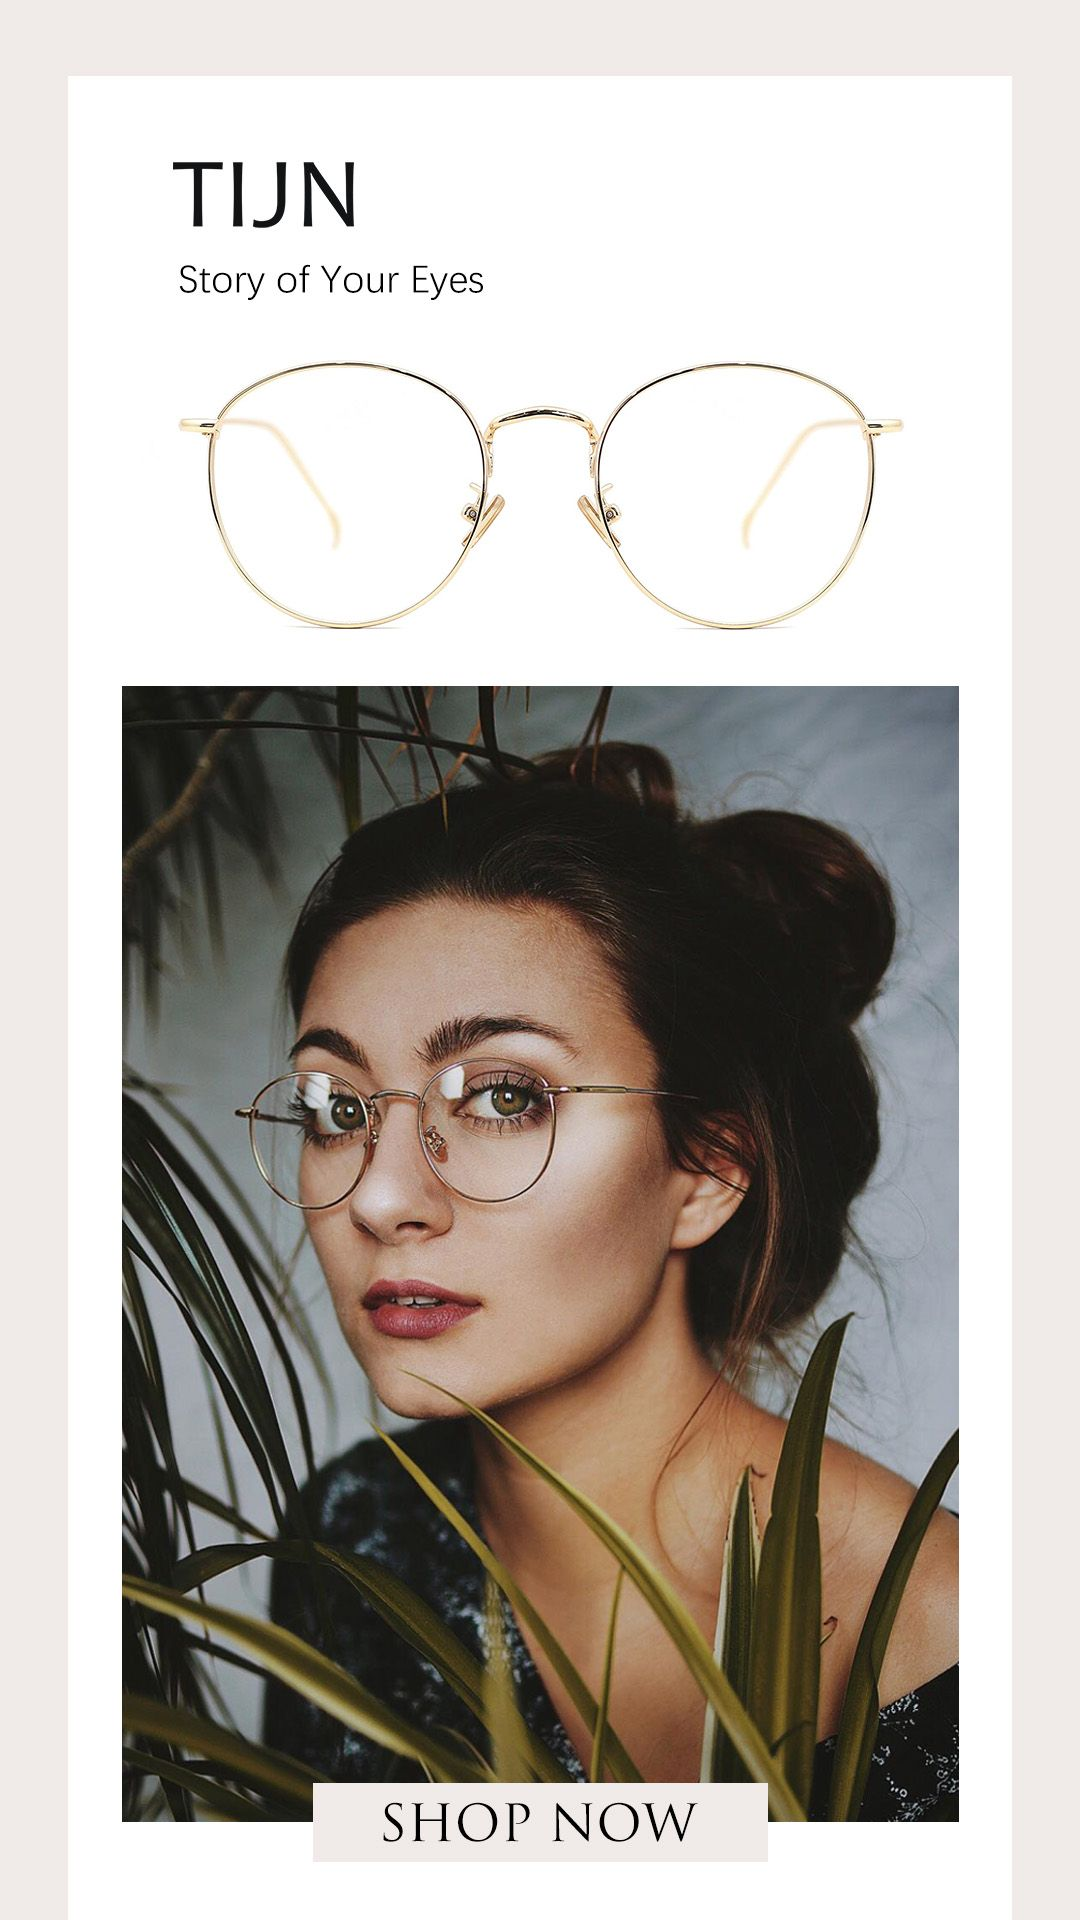 c18d4f8e4fd Eyewear Trends 2018 Women NEW Fashion. You may get a new look.Top sale  glasses.  eyewear  fashion eyewear  sunglasses eye